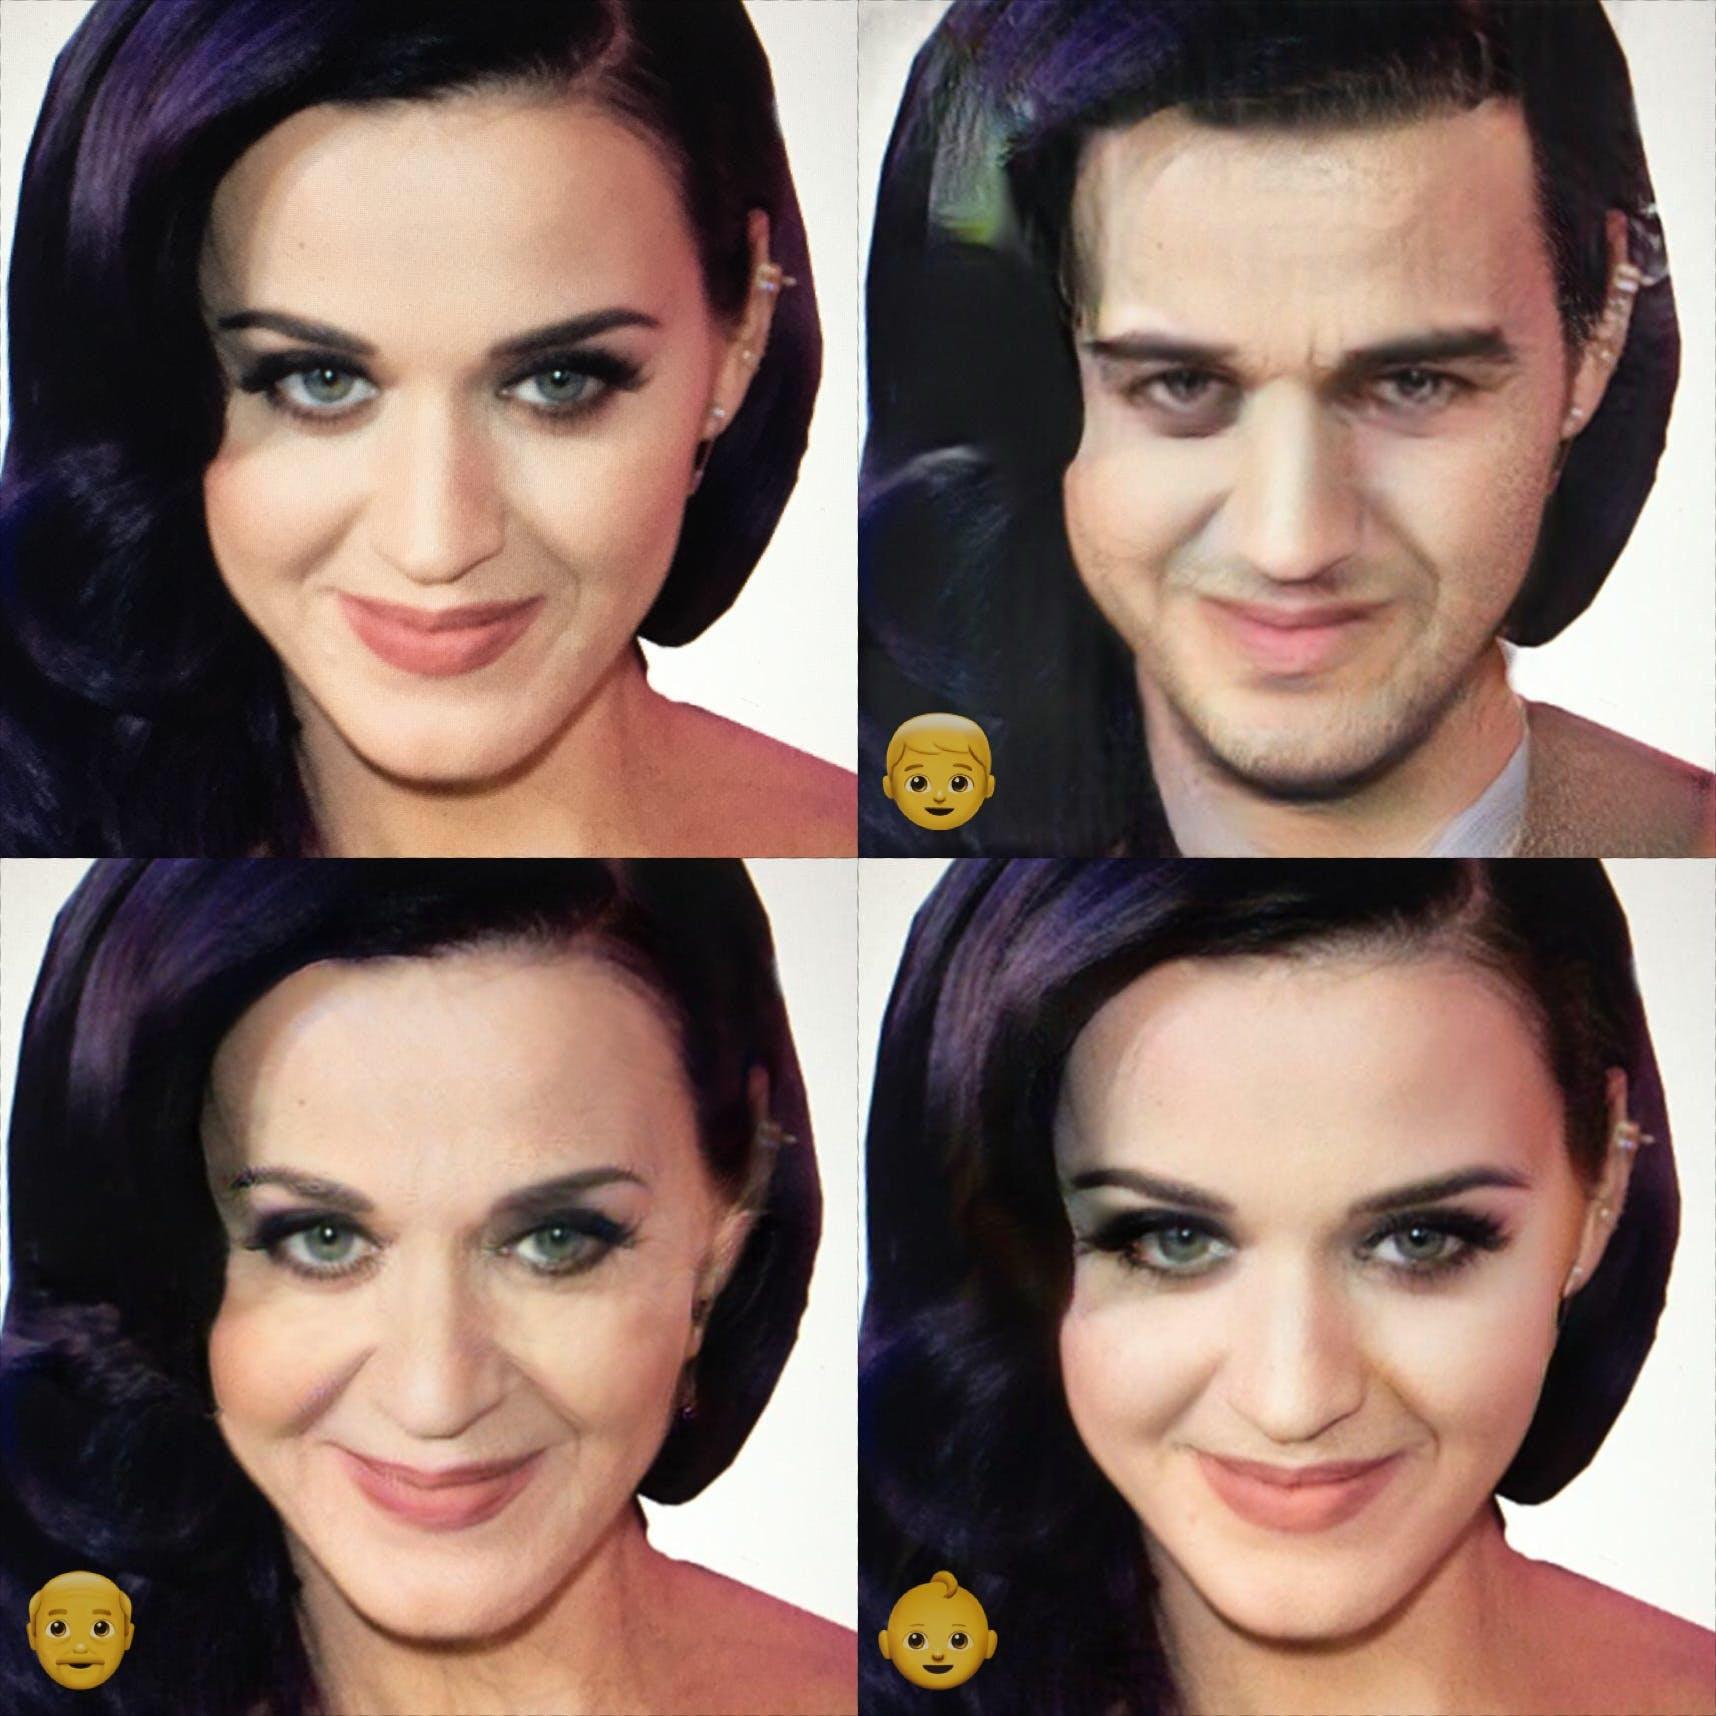 Katy Perry put through FaceApp